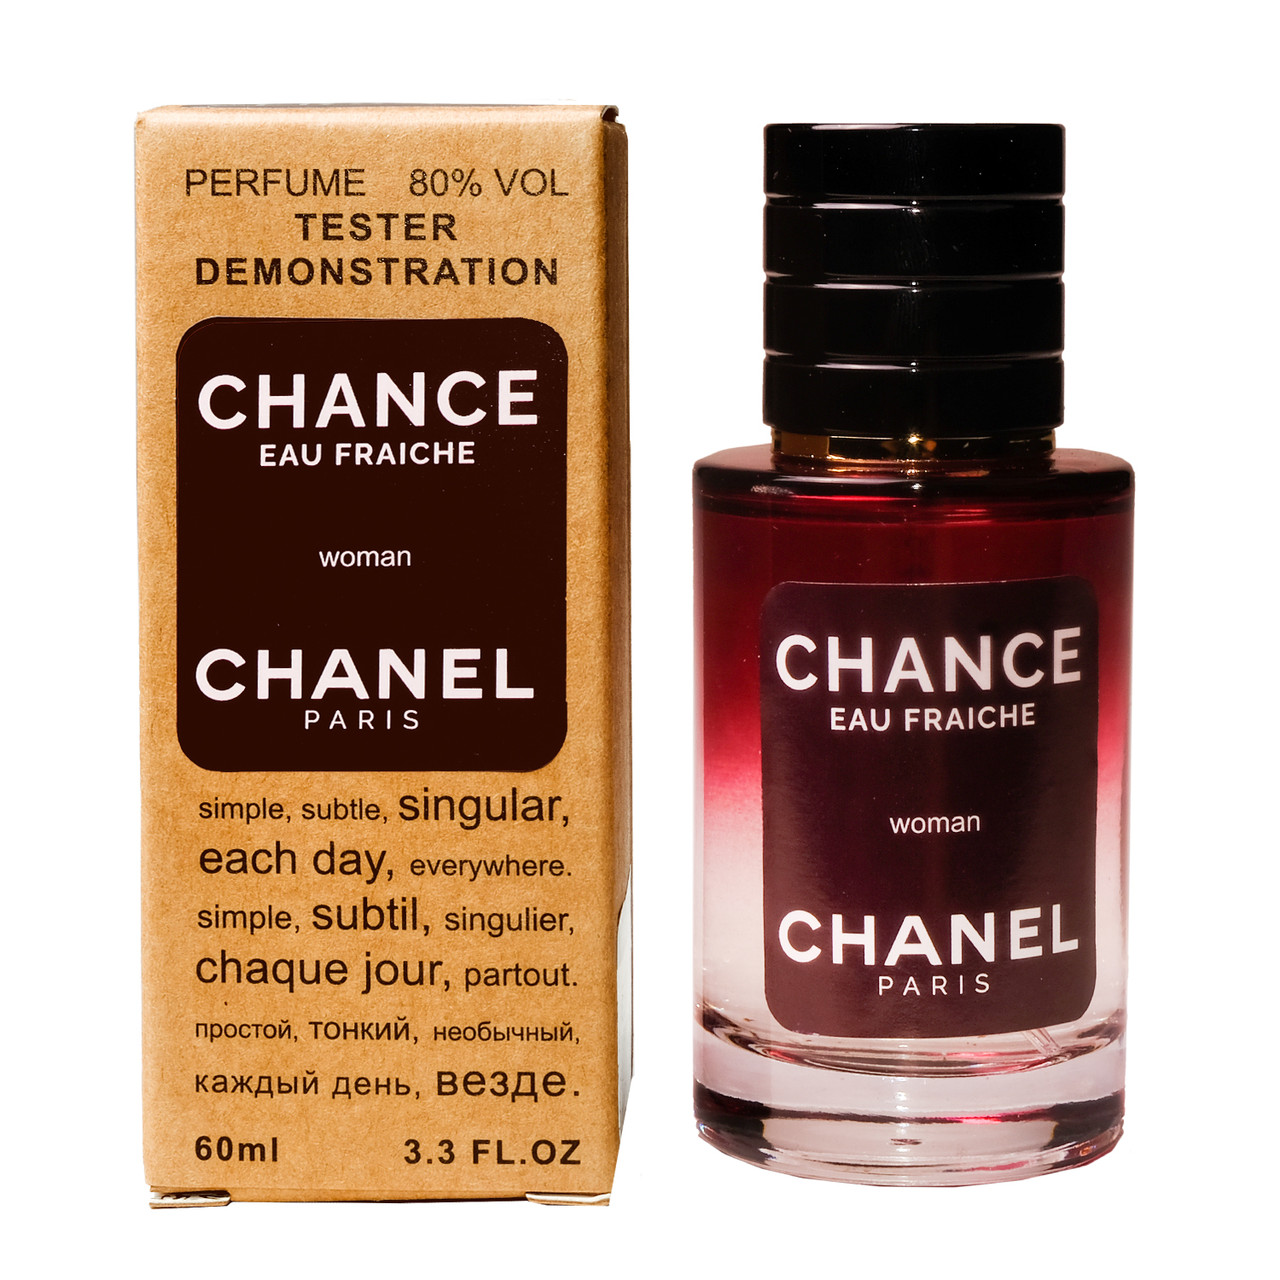 Chanel Chance Eau Fraiche TESTER LUX, женский, 60 мл